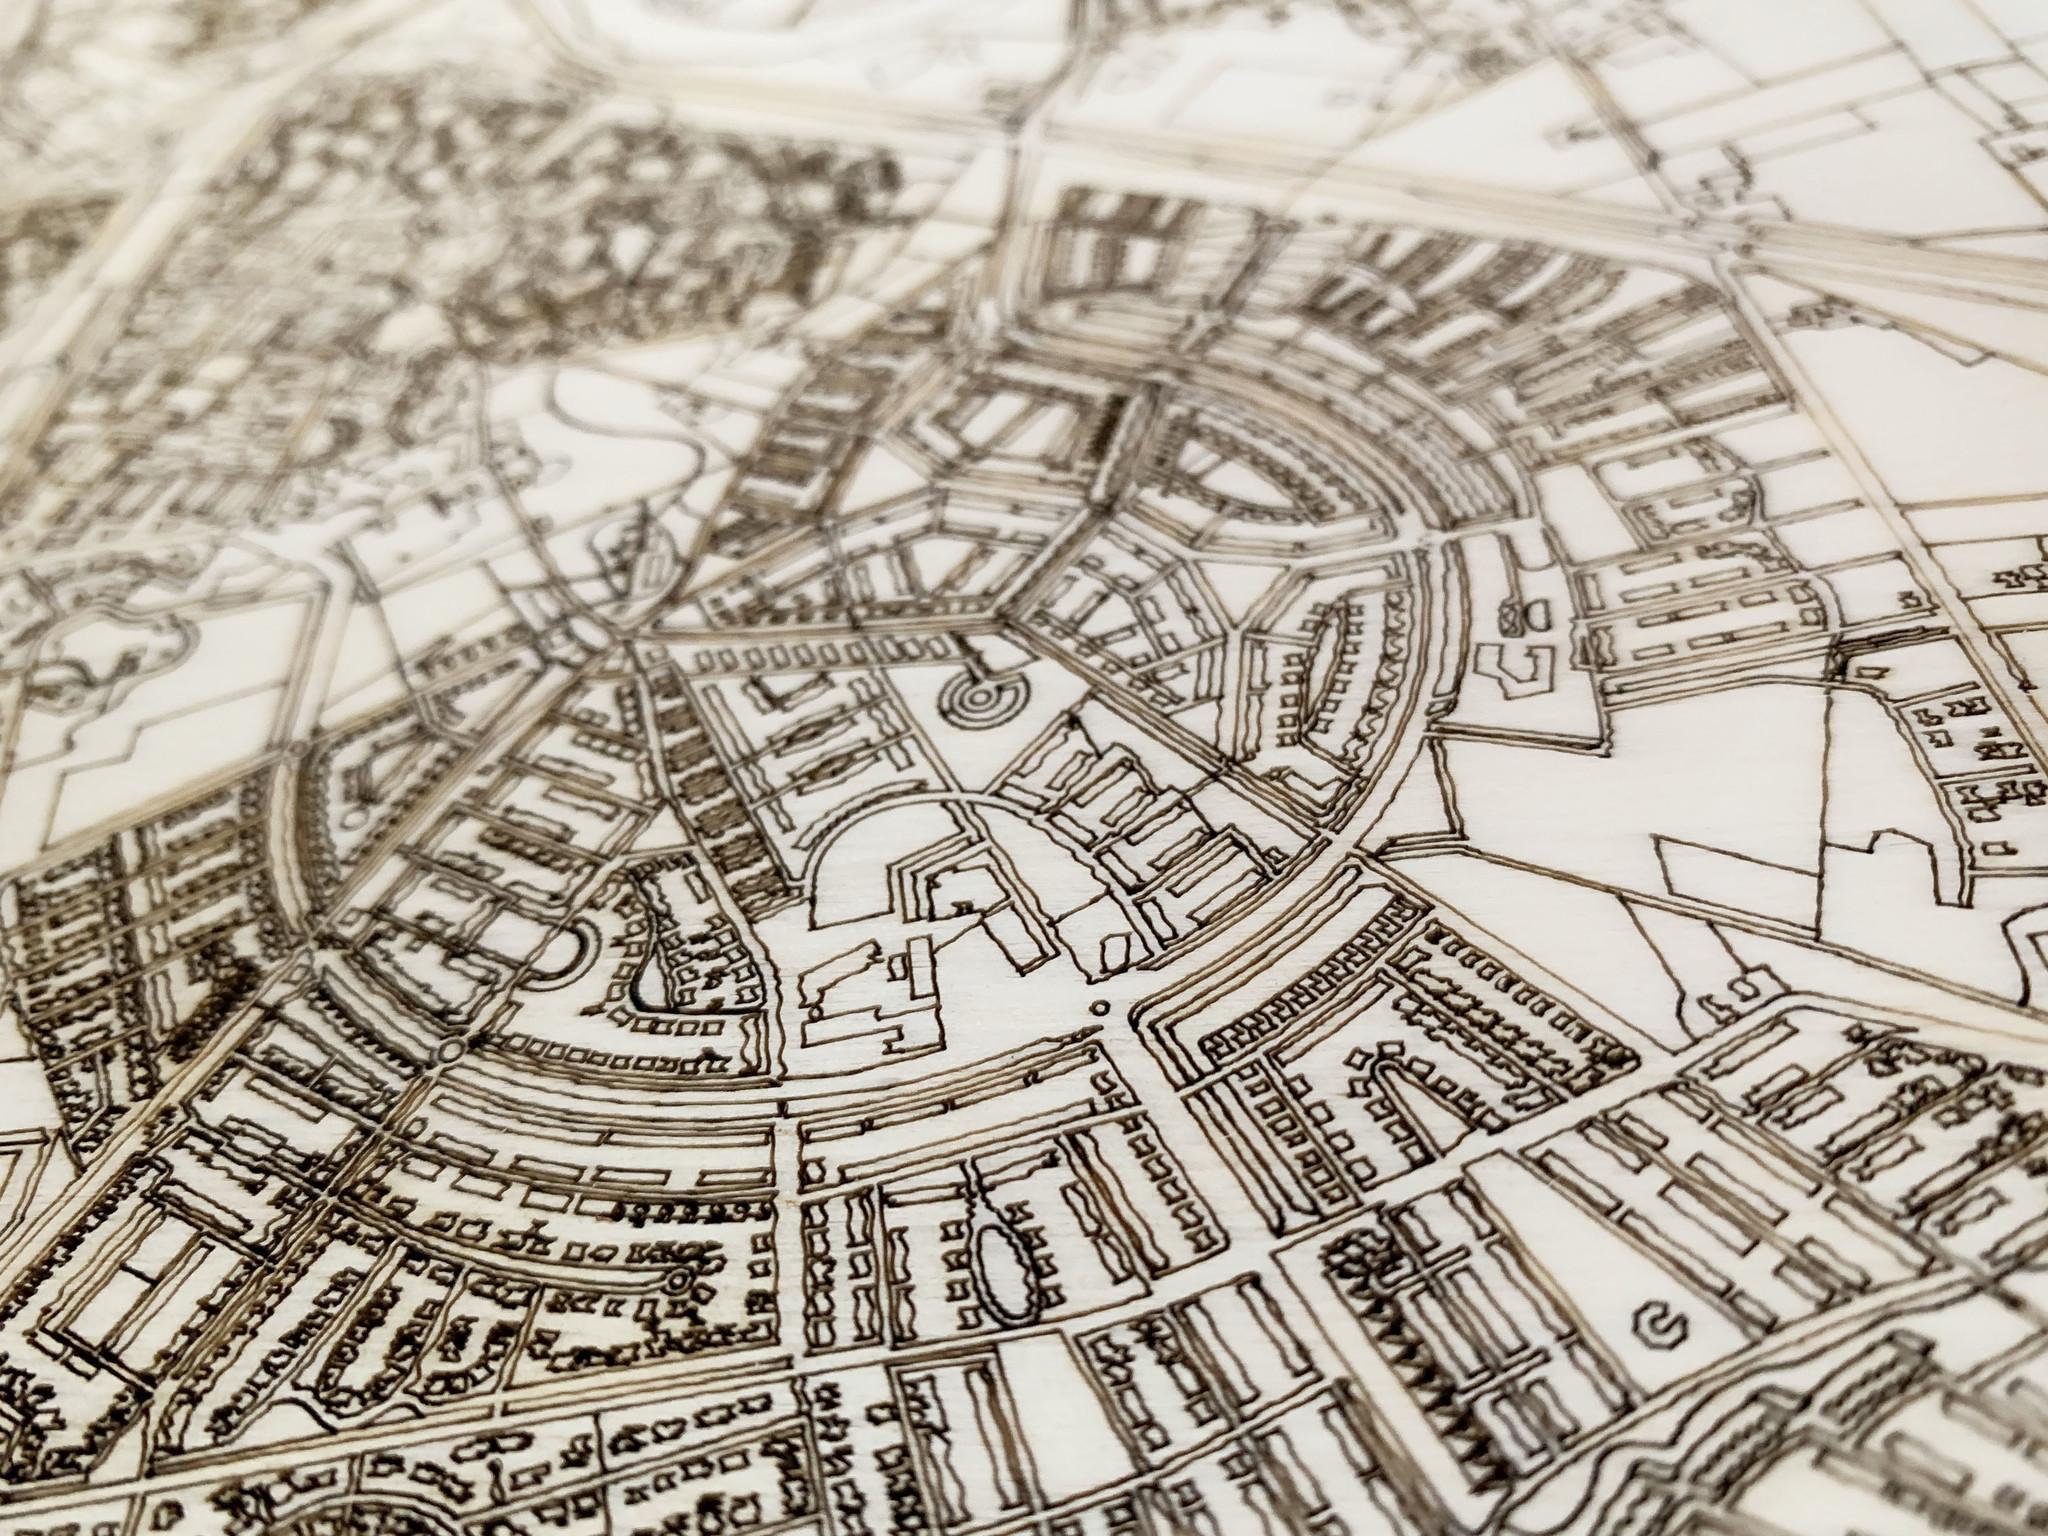 Houten stadsplattegrond Den Bosch-4